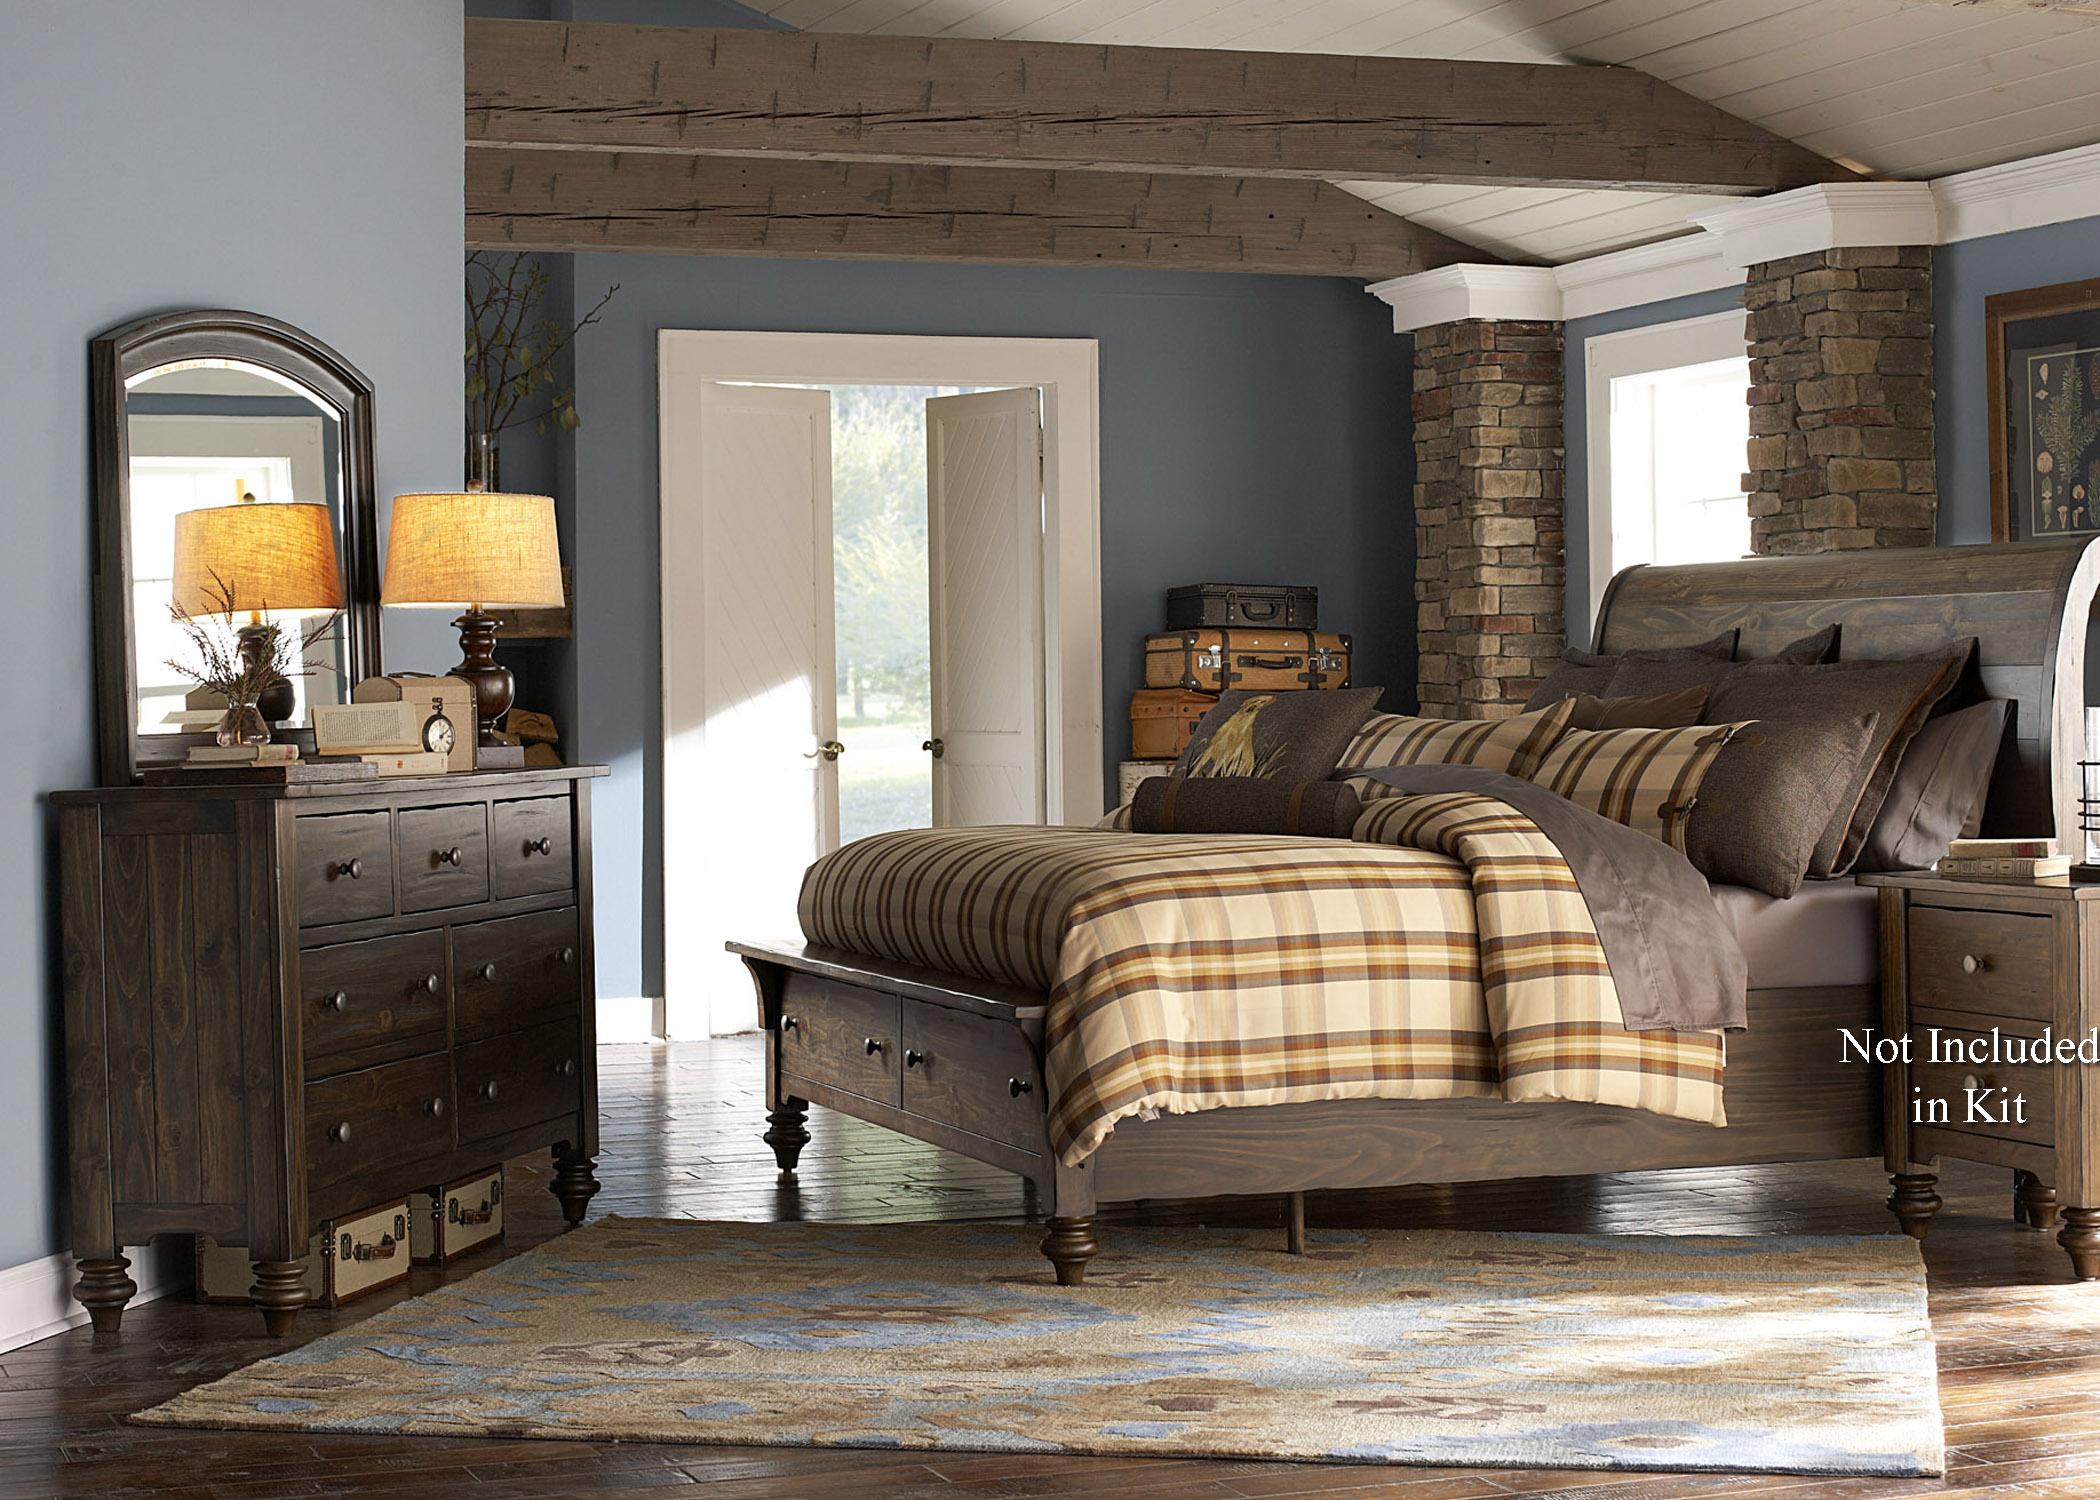 Liberty Furniture Southern Pines King Bedroom Group - Item Number: 818-BR-KSBDM